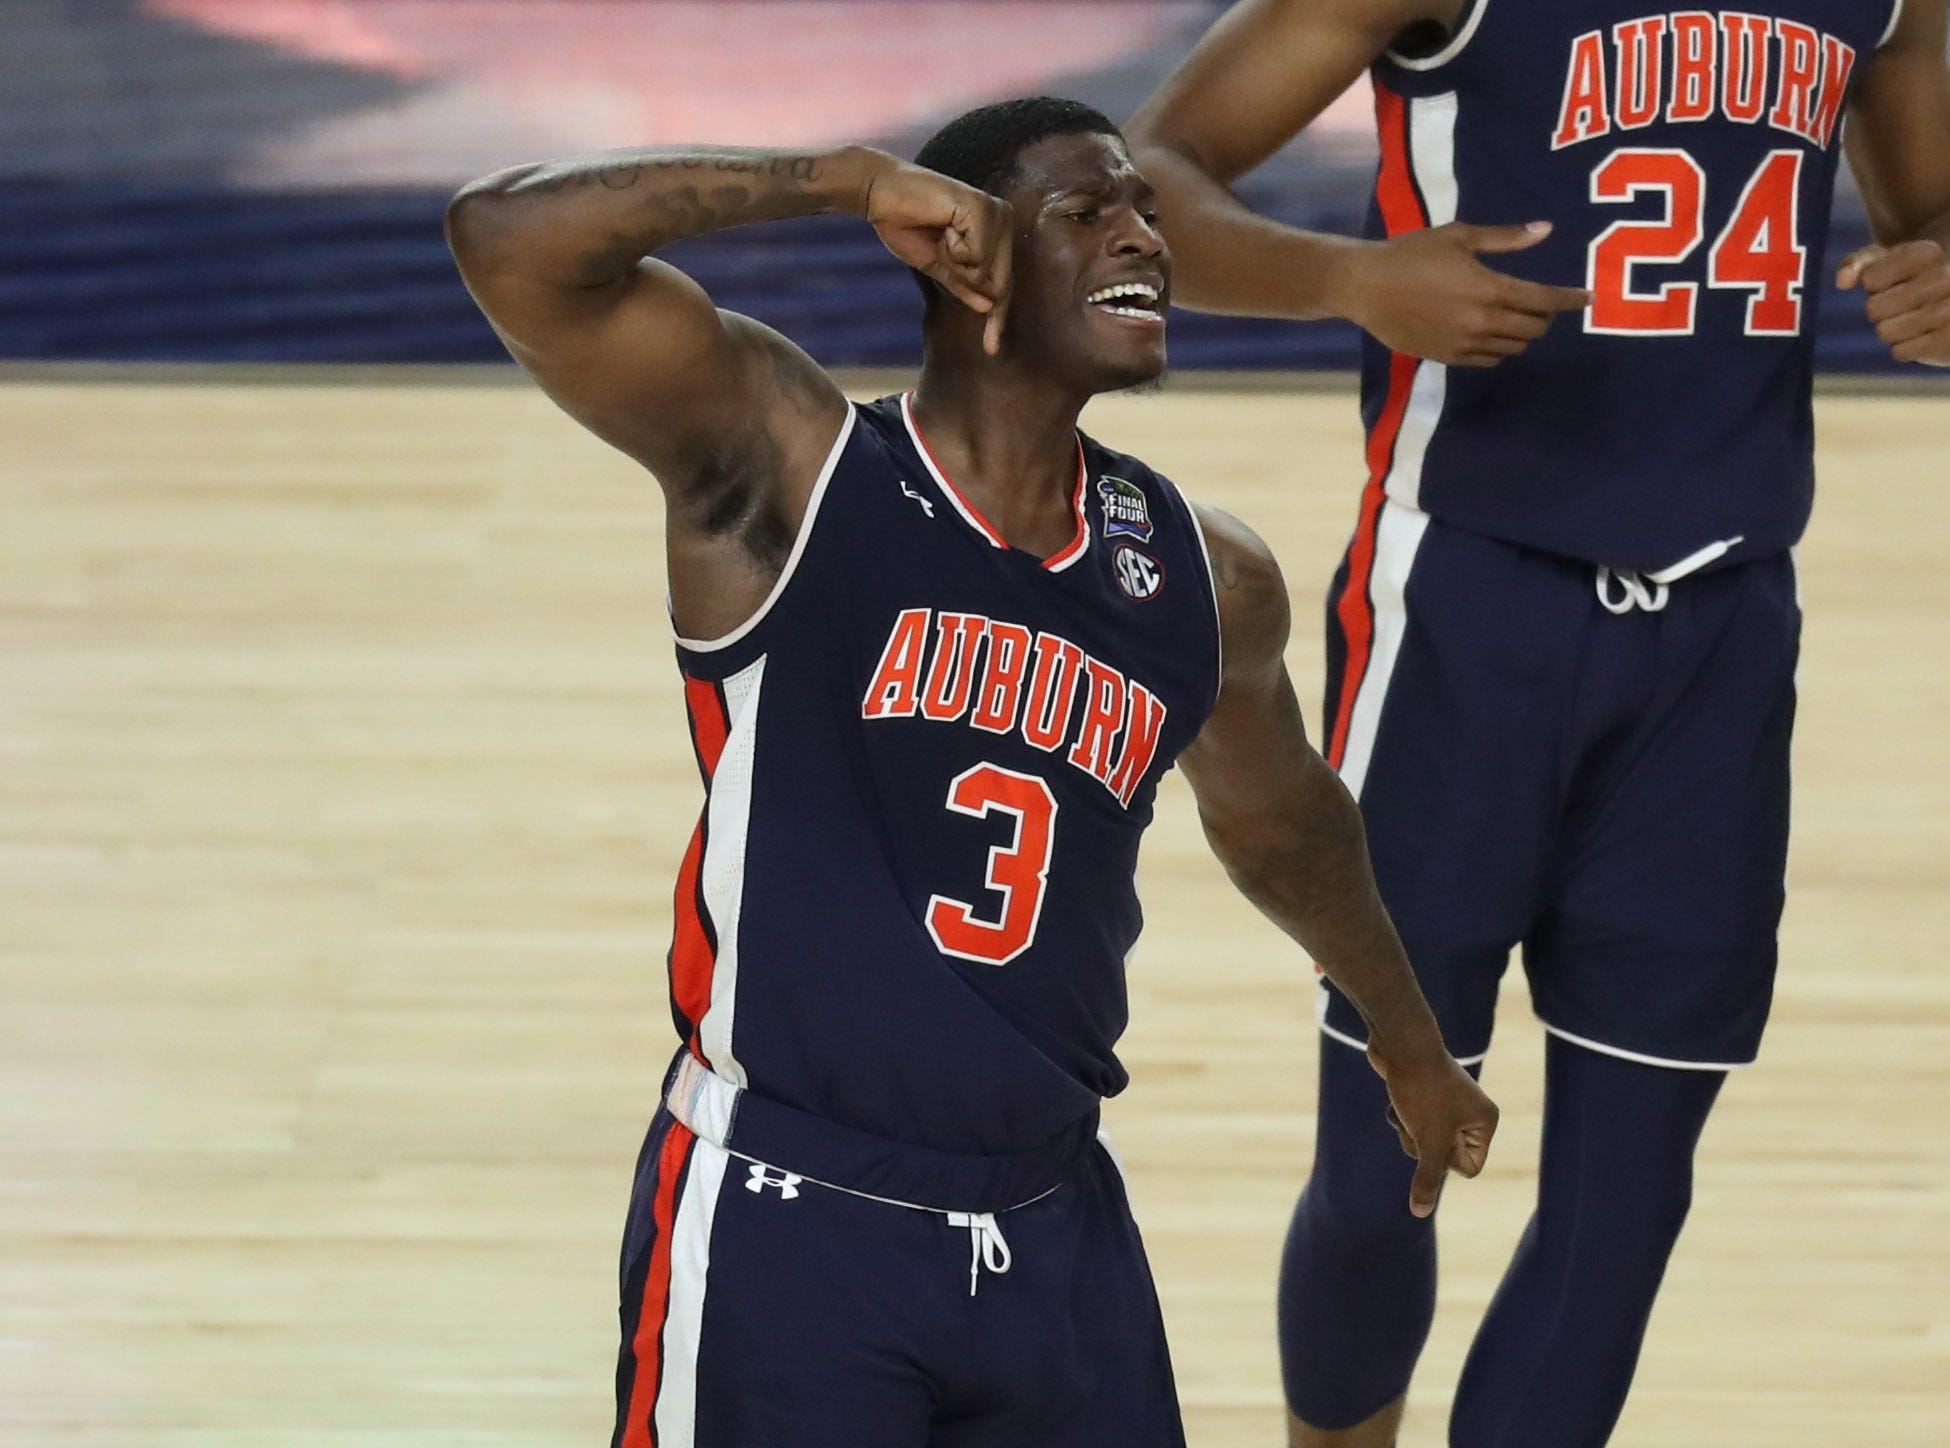 Auburn Tigers forward Danjel Purifoy (3) celebrates during the second half against the Virginia Cavaliers.